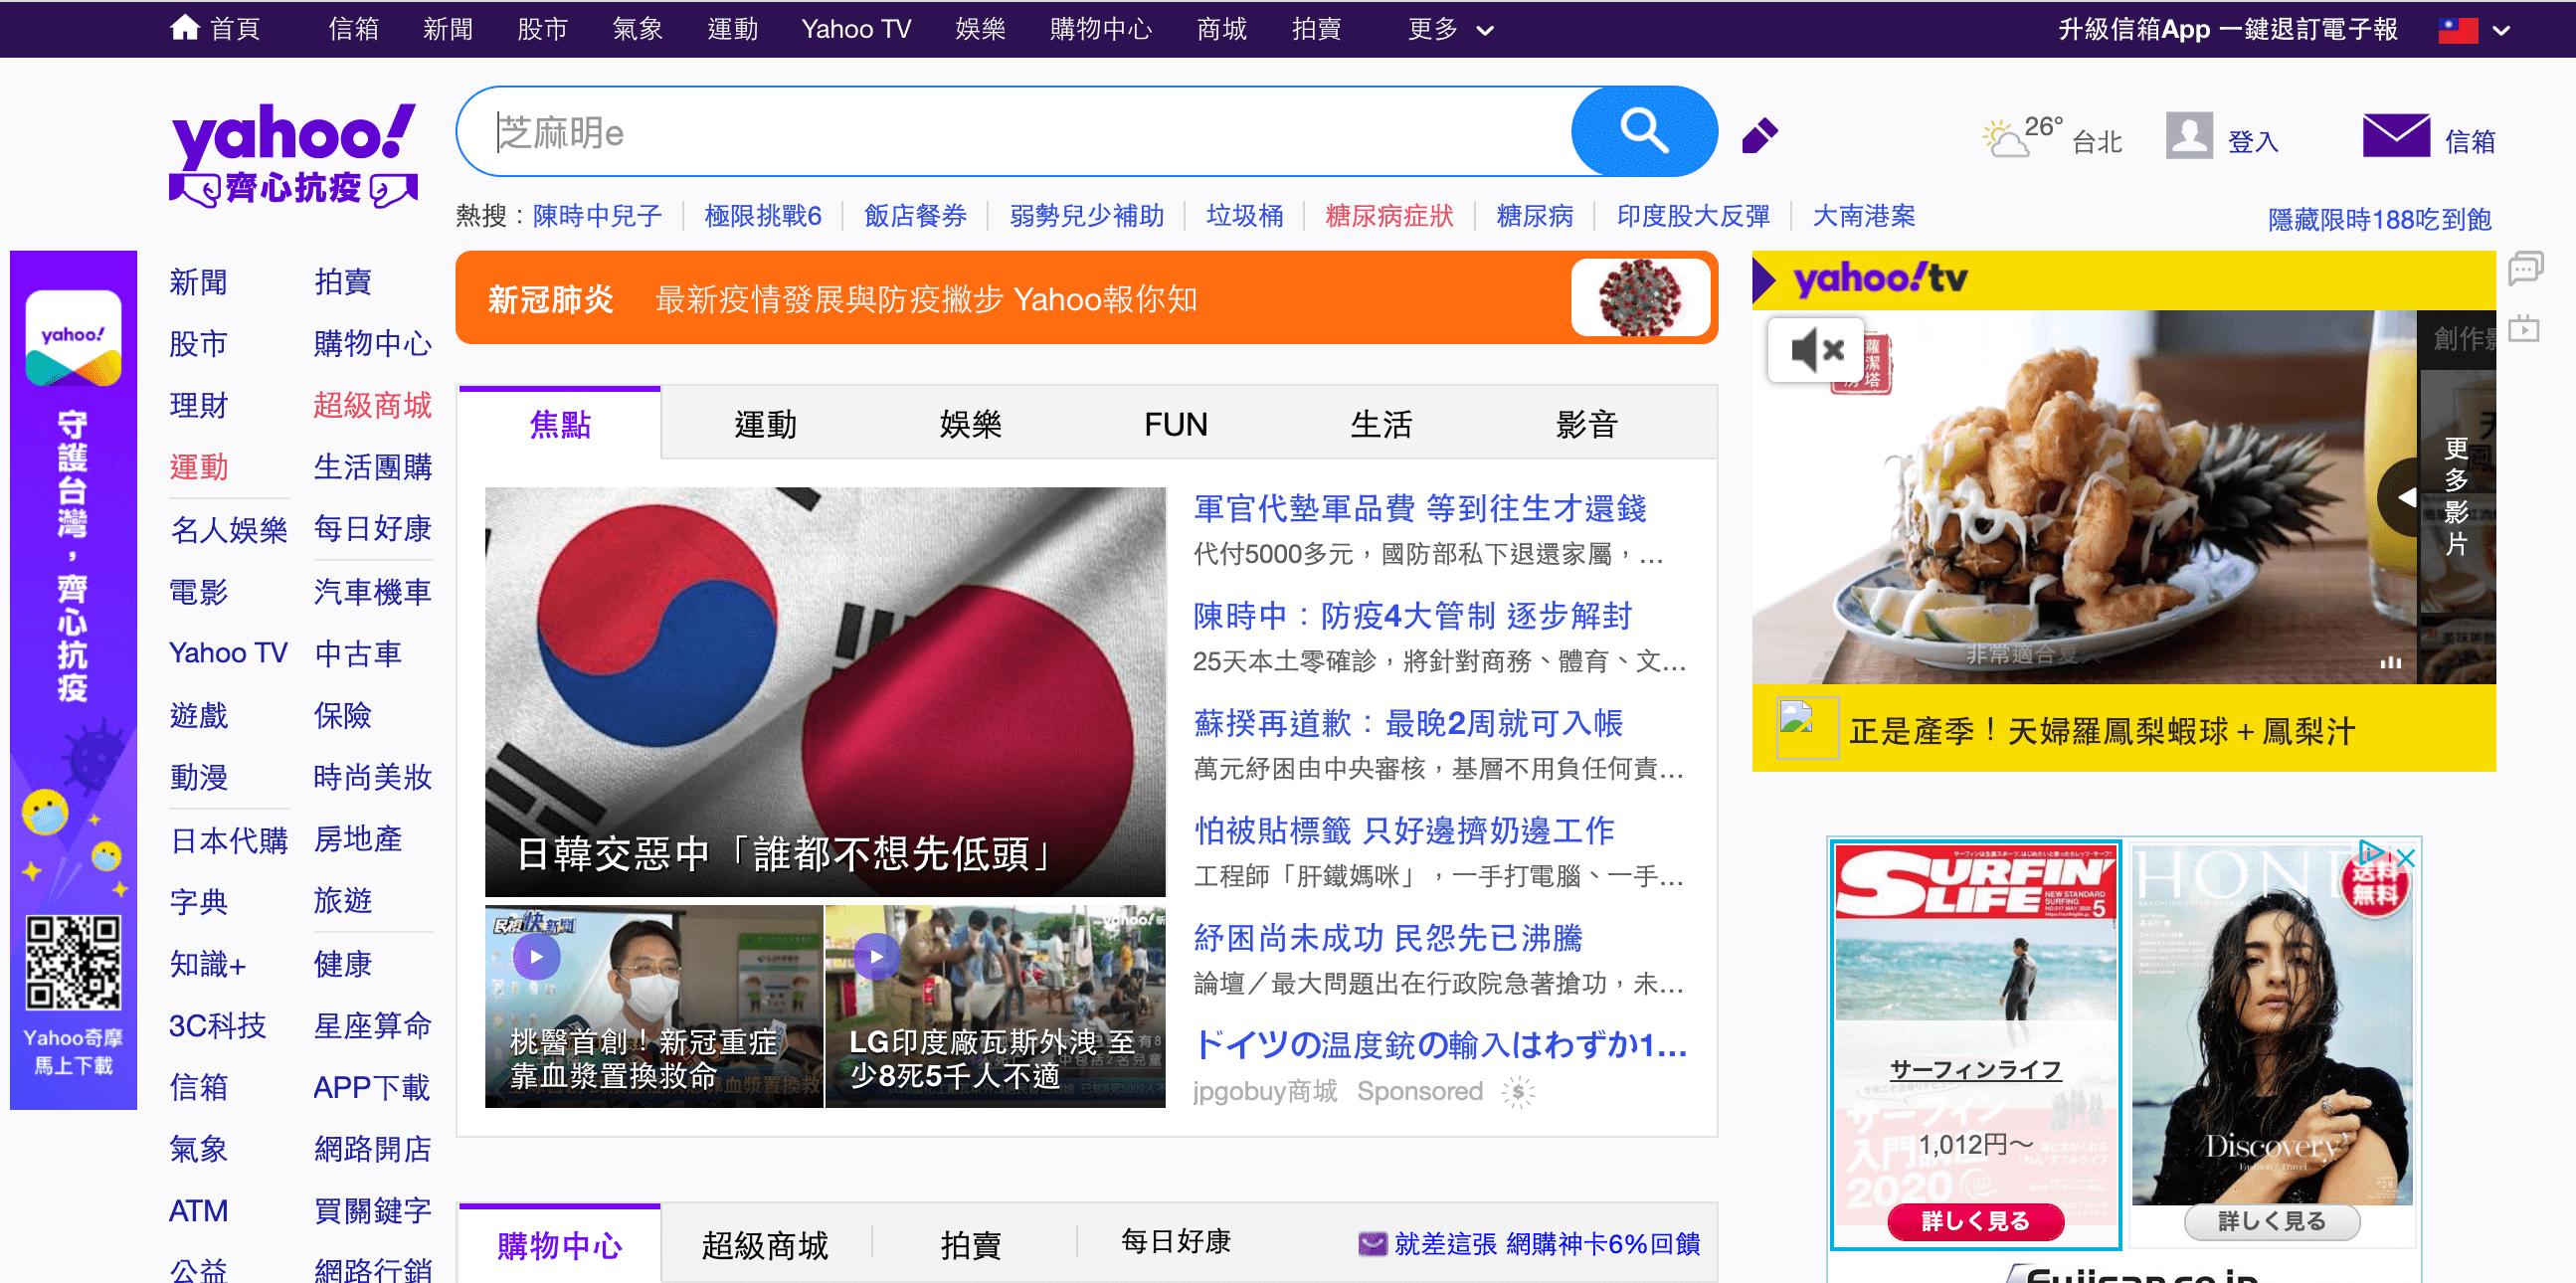 Yahoo!奇摩 (1)